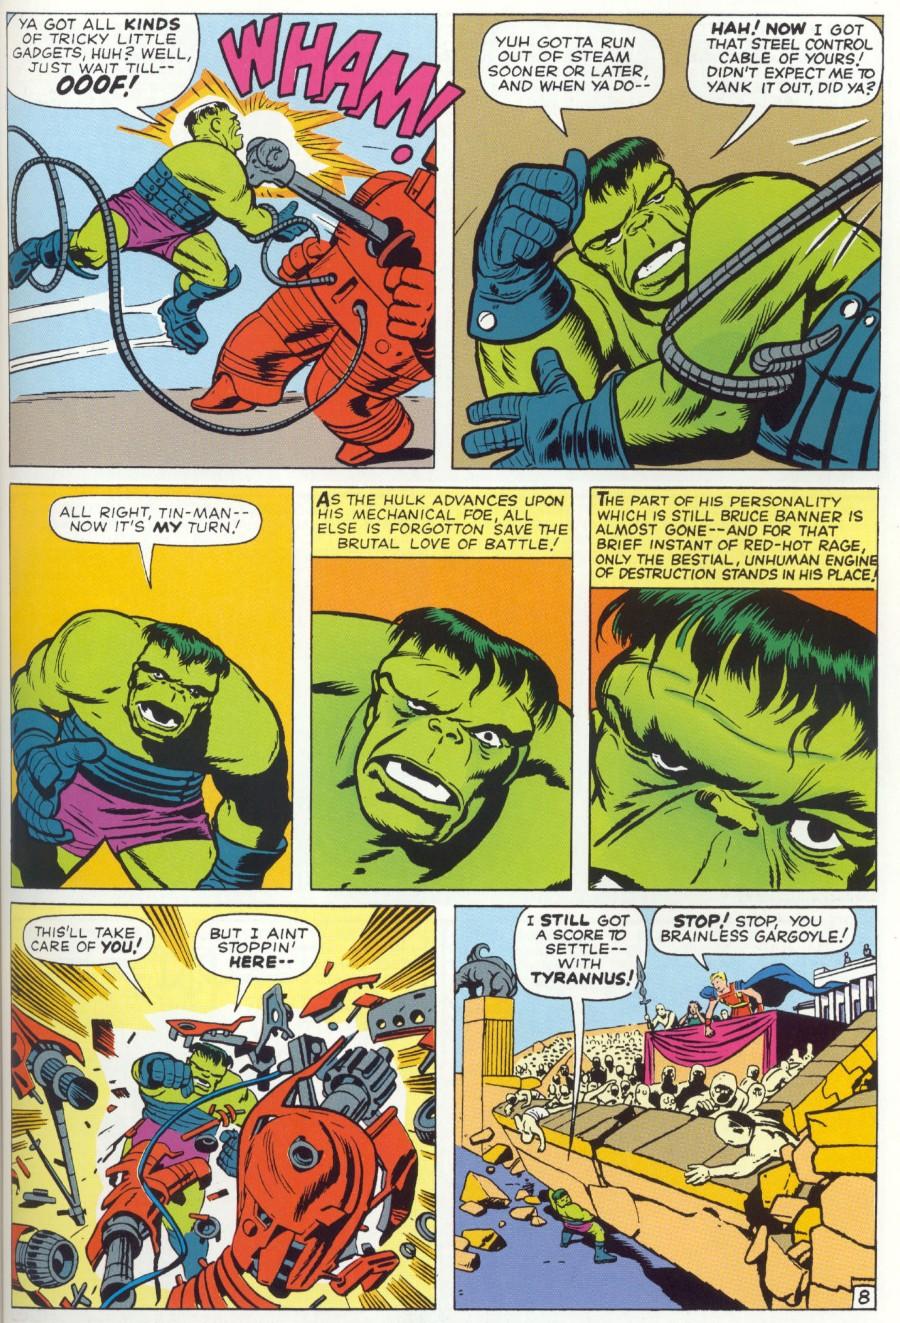 Incredible hulk here is some artwork from incredible hulk 5 jan